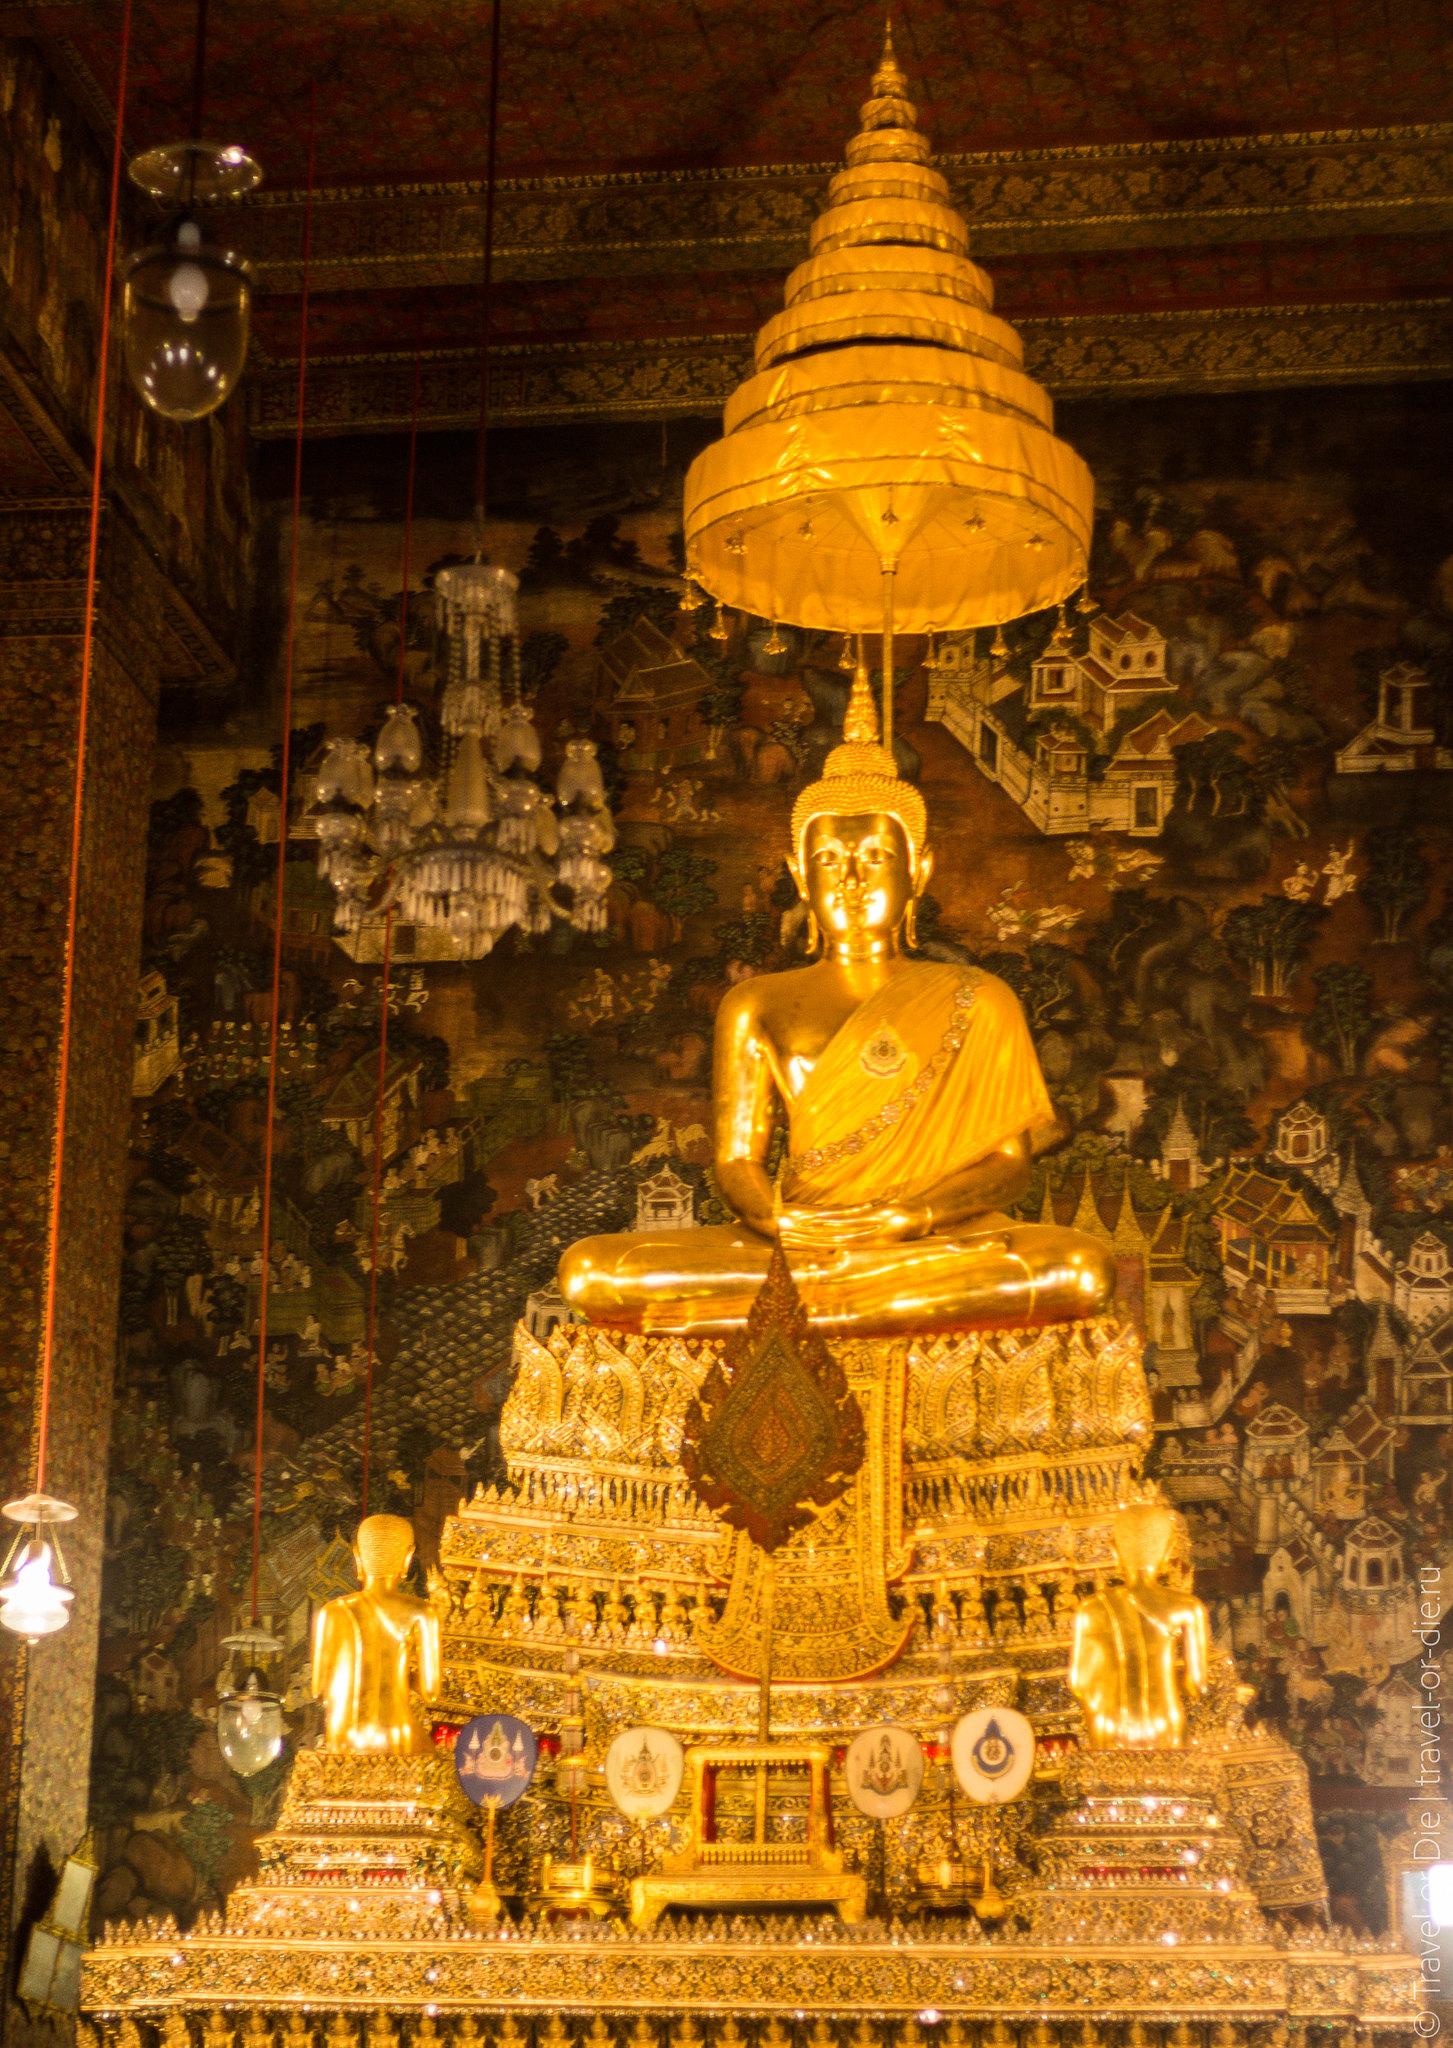 Wat-Pho-Bangkok-Храм-Лежащего-Будды-9299